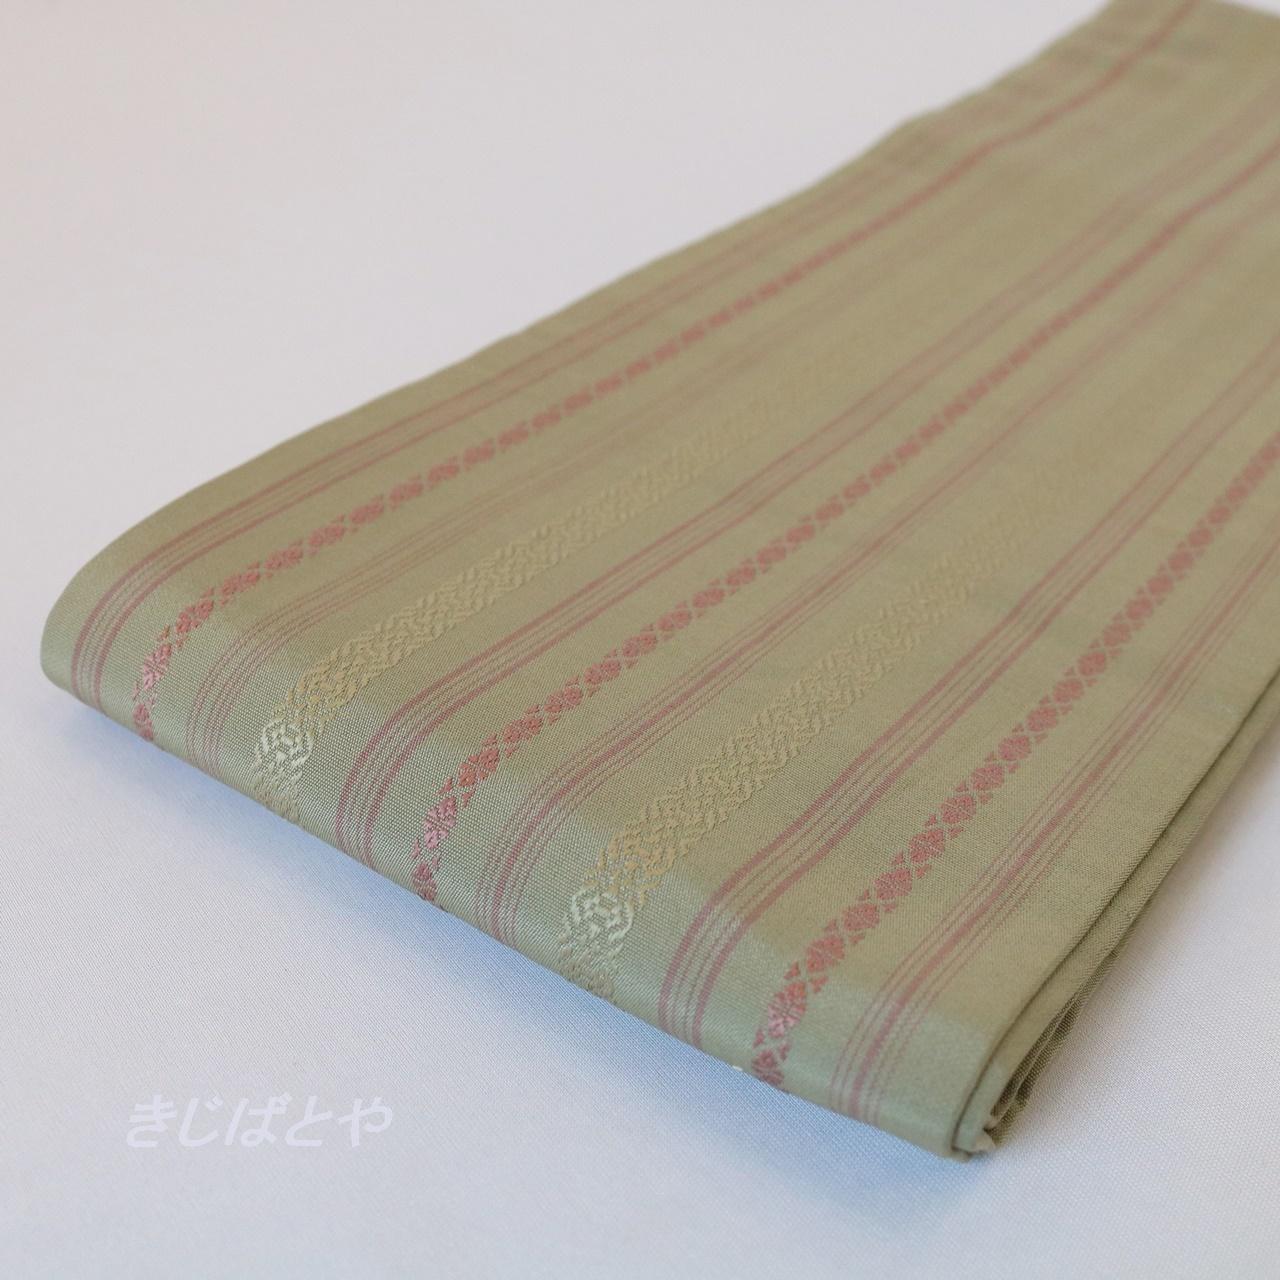 正絹 柳葉色の博多半幅帯